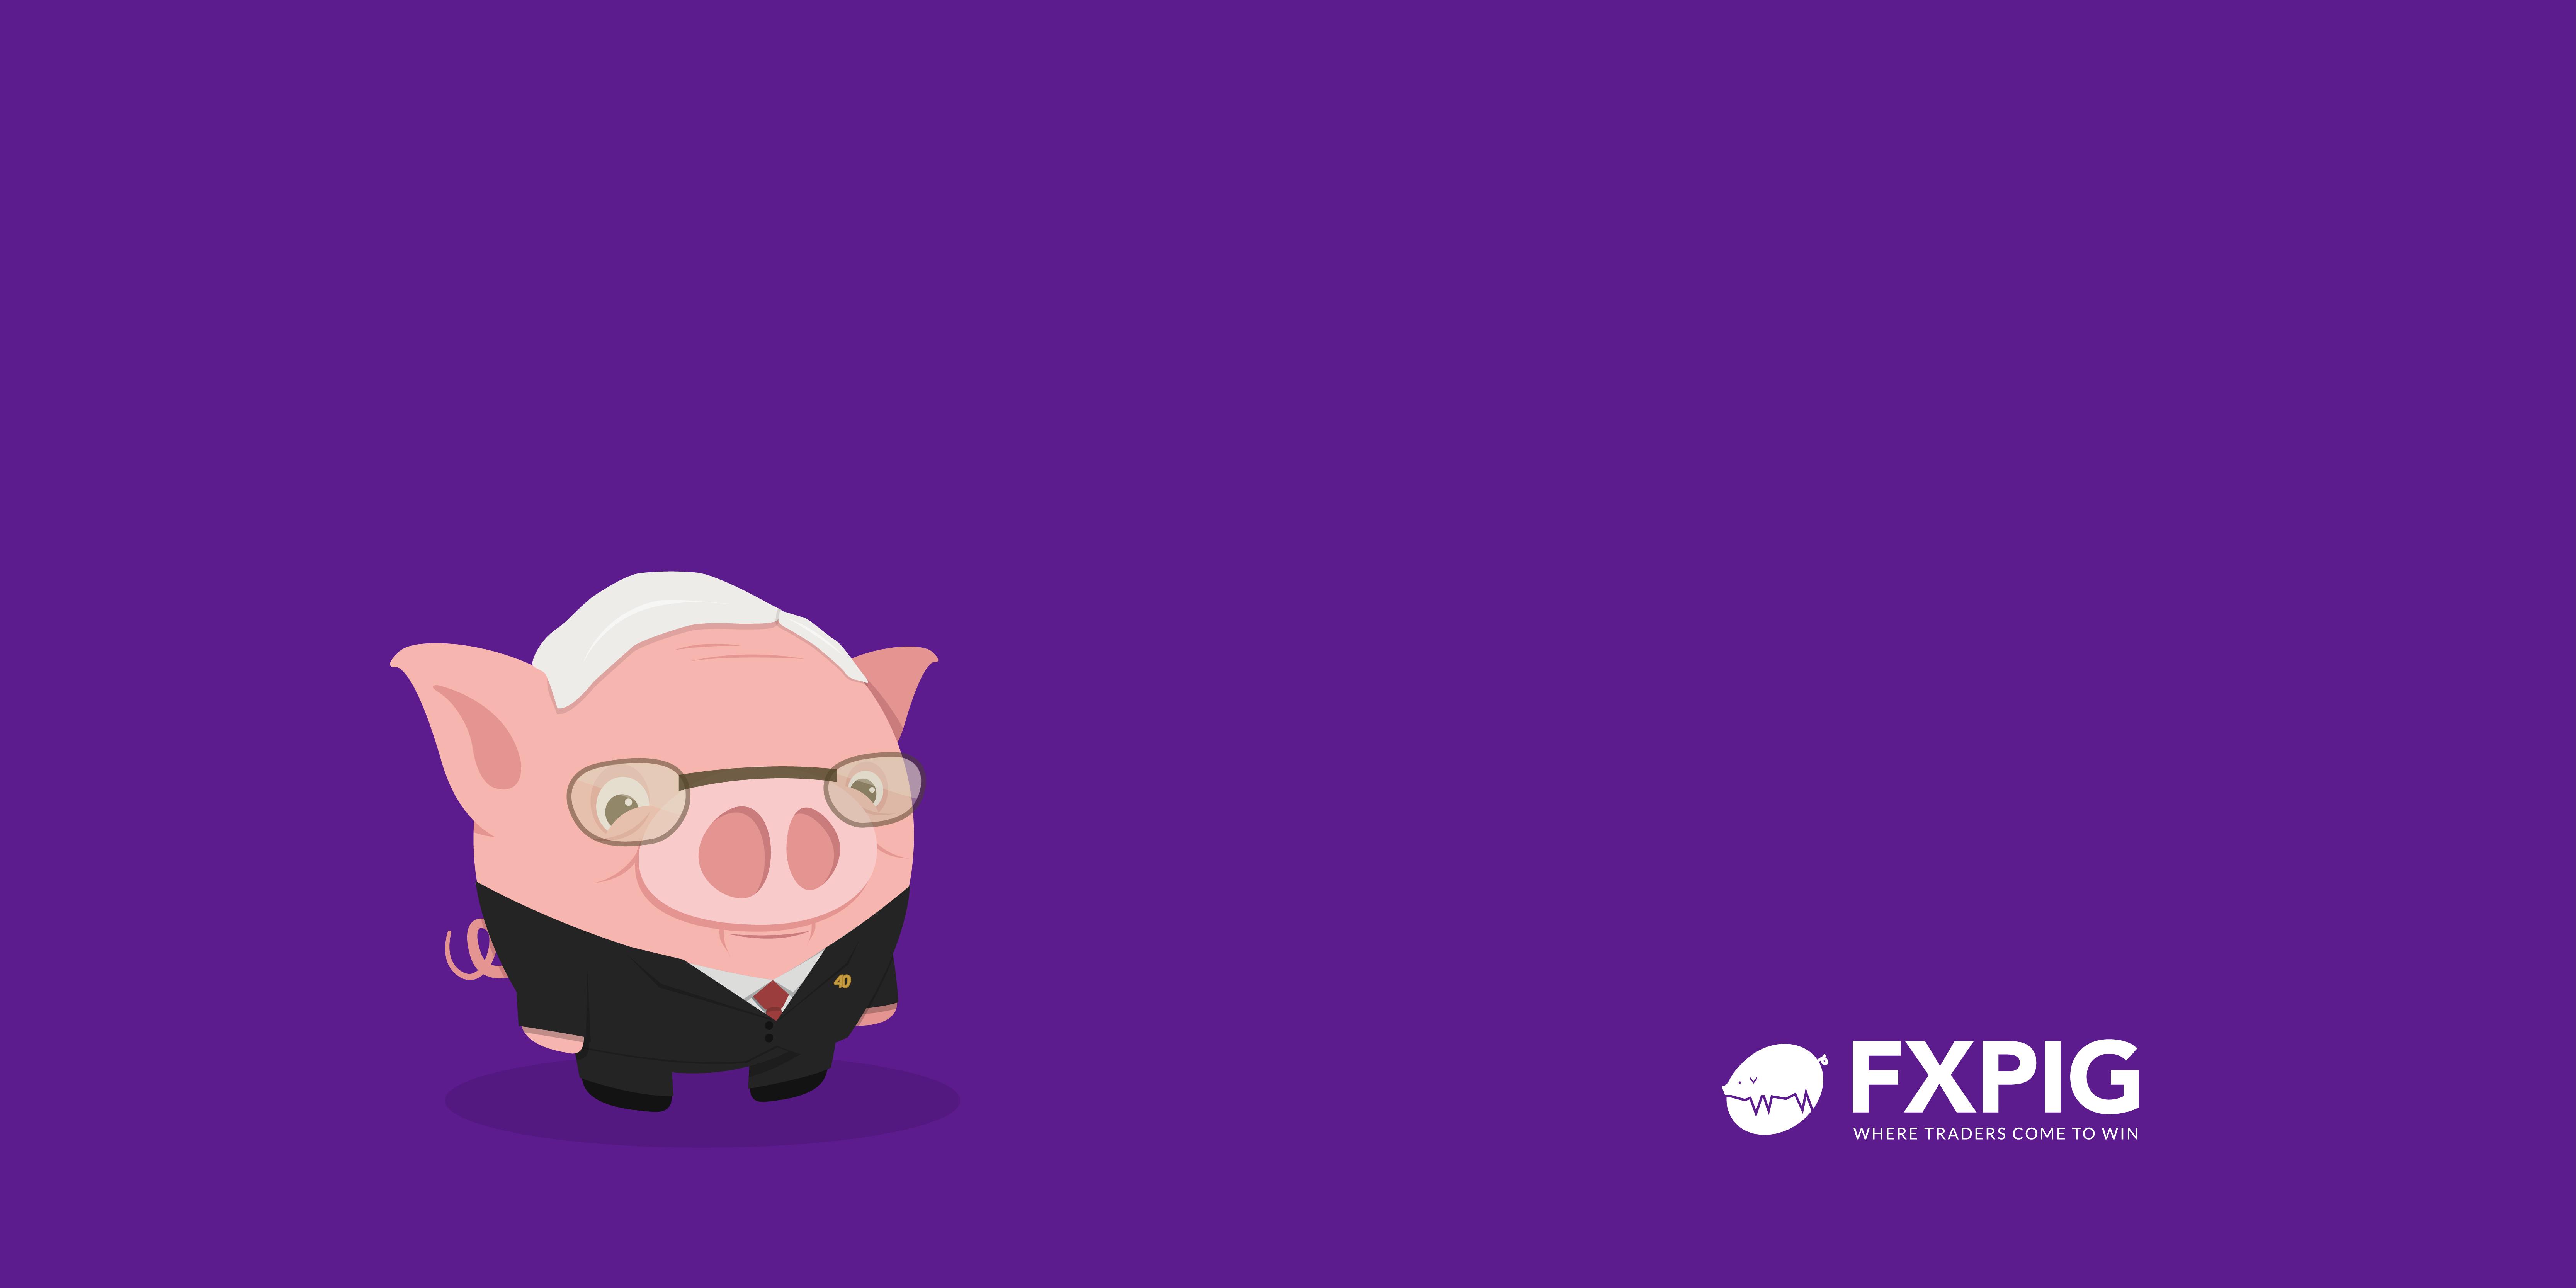 FOREX_Trading-wisdom_Quote_Warren-Buffett_FXPIG